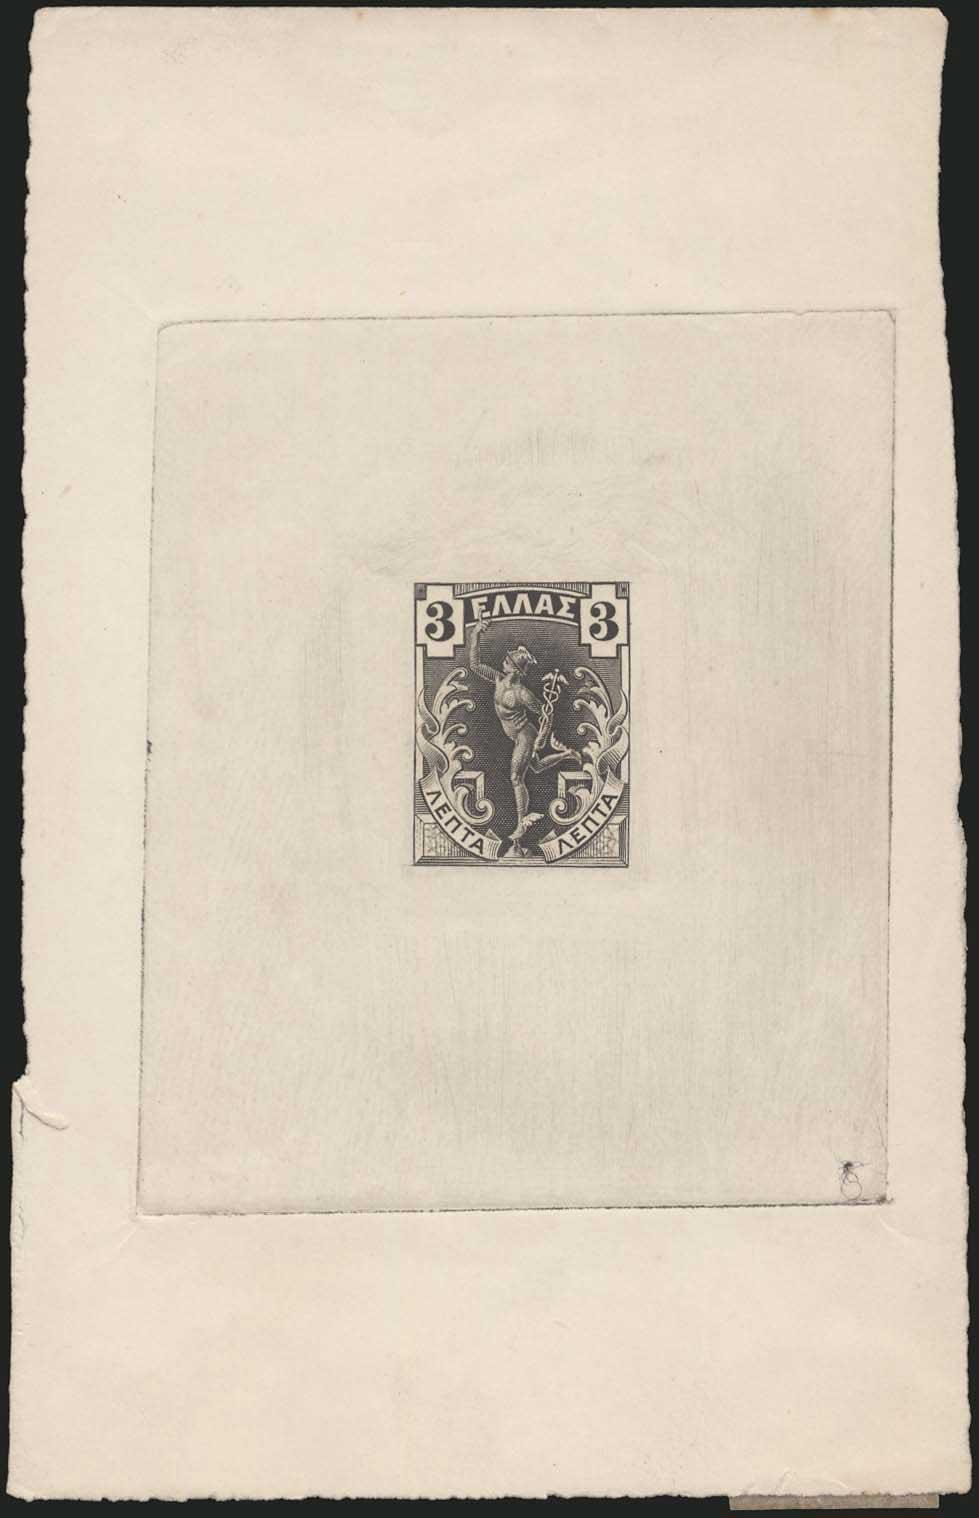 Lot 419 - -  1901/02 FLYING MERCURY & A.M. 1901/02 FLYING MERCURY & A.M. -  A. Karamitsos Public Auction 639 General Stamp Sale